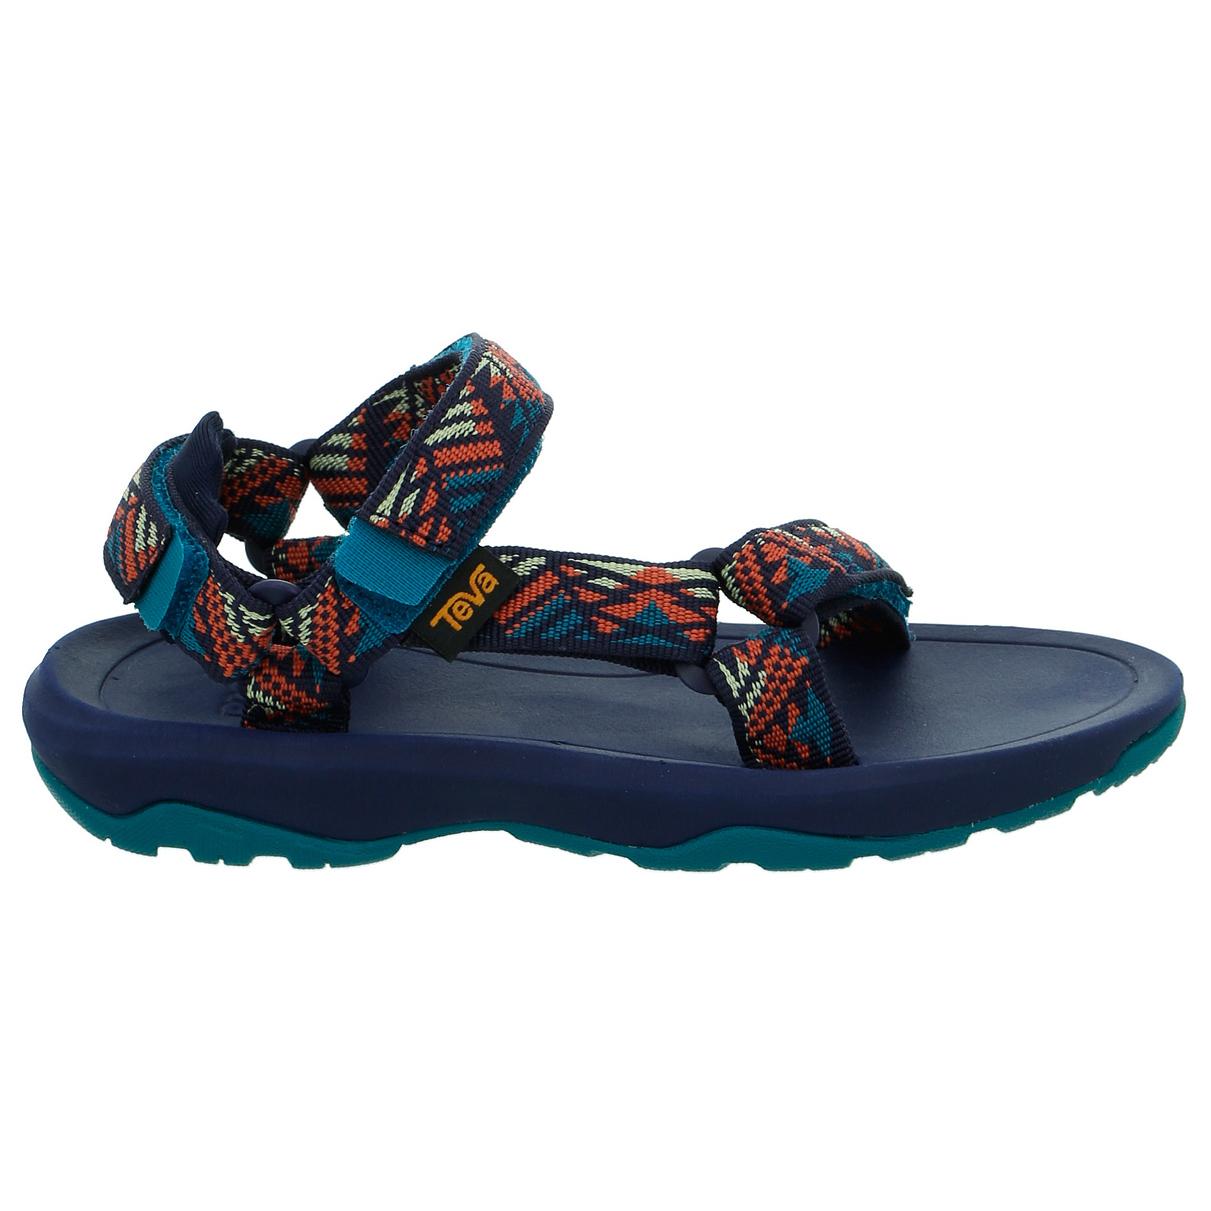 b3ff78590748 Teva - Kid s Hurricane XLT 2 - Sandals